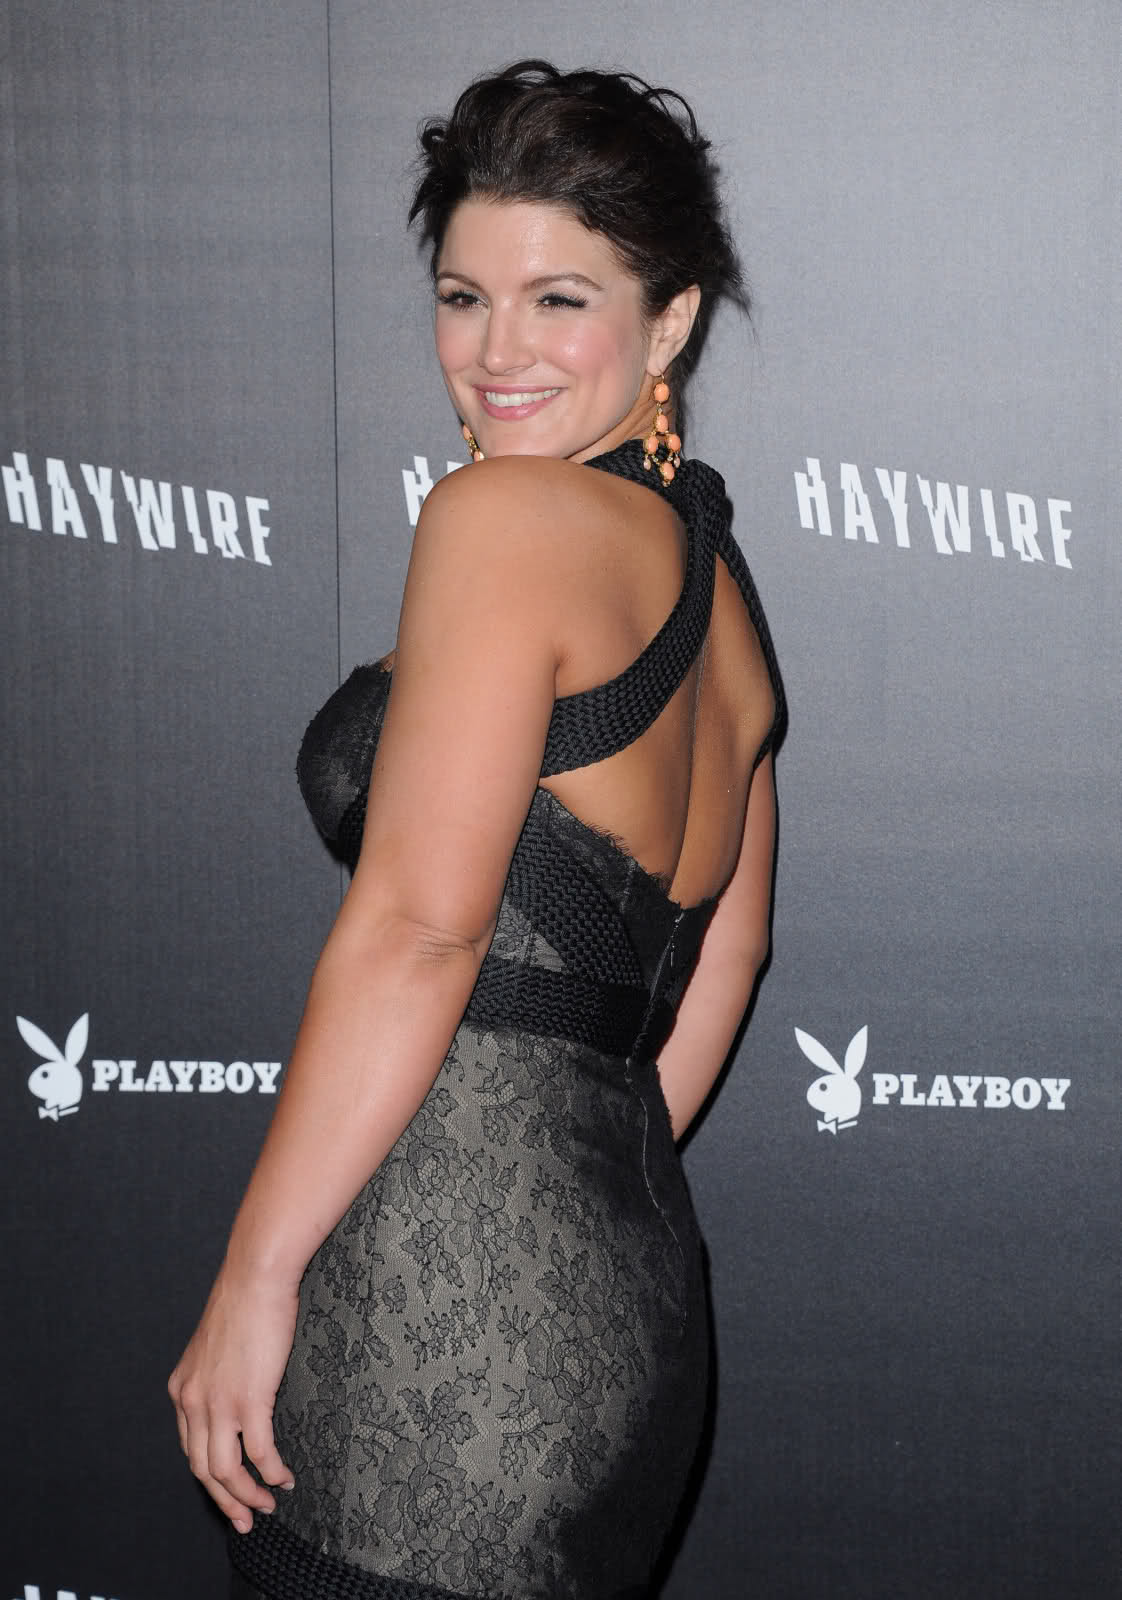 Gina Carano awesome booty (1)